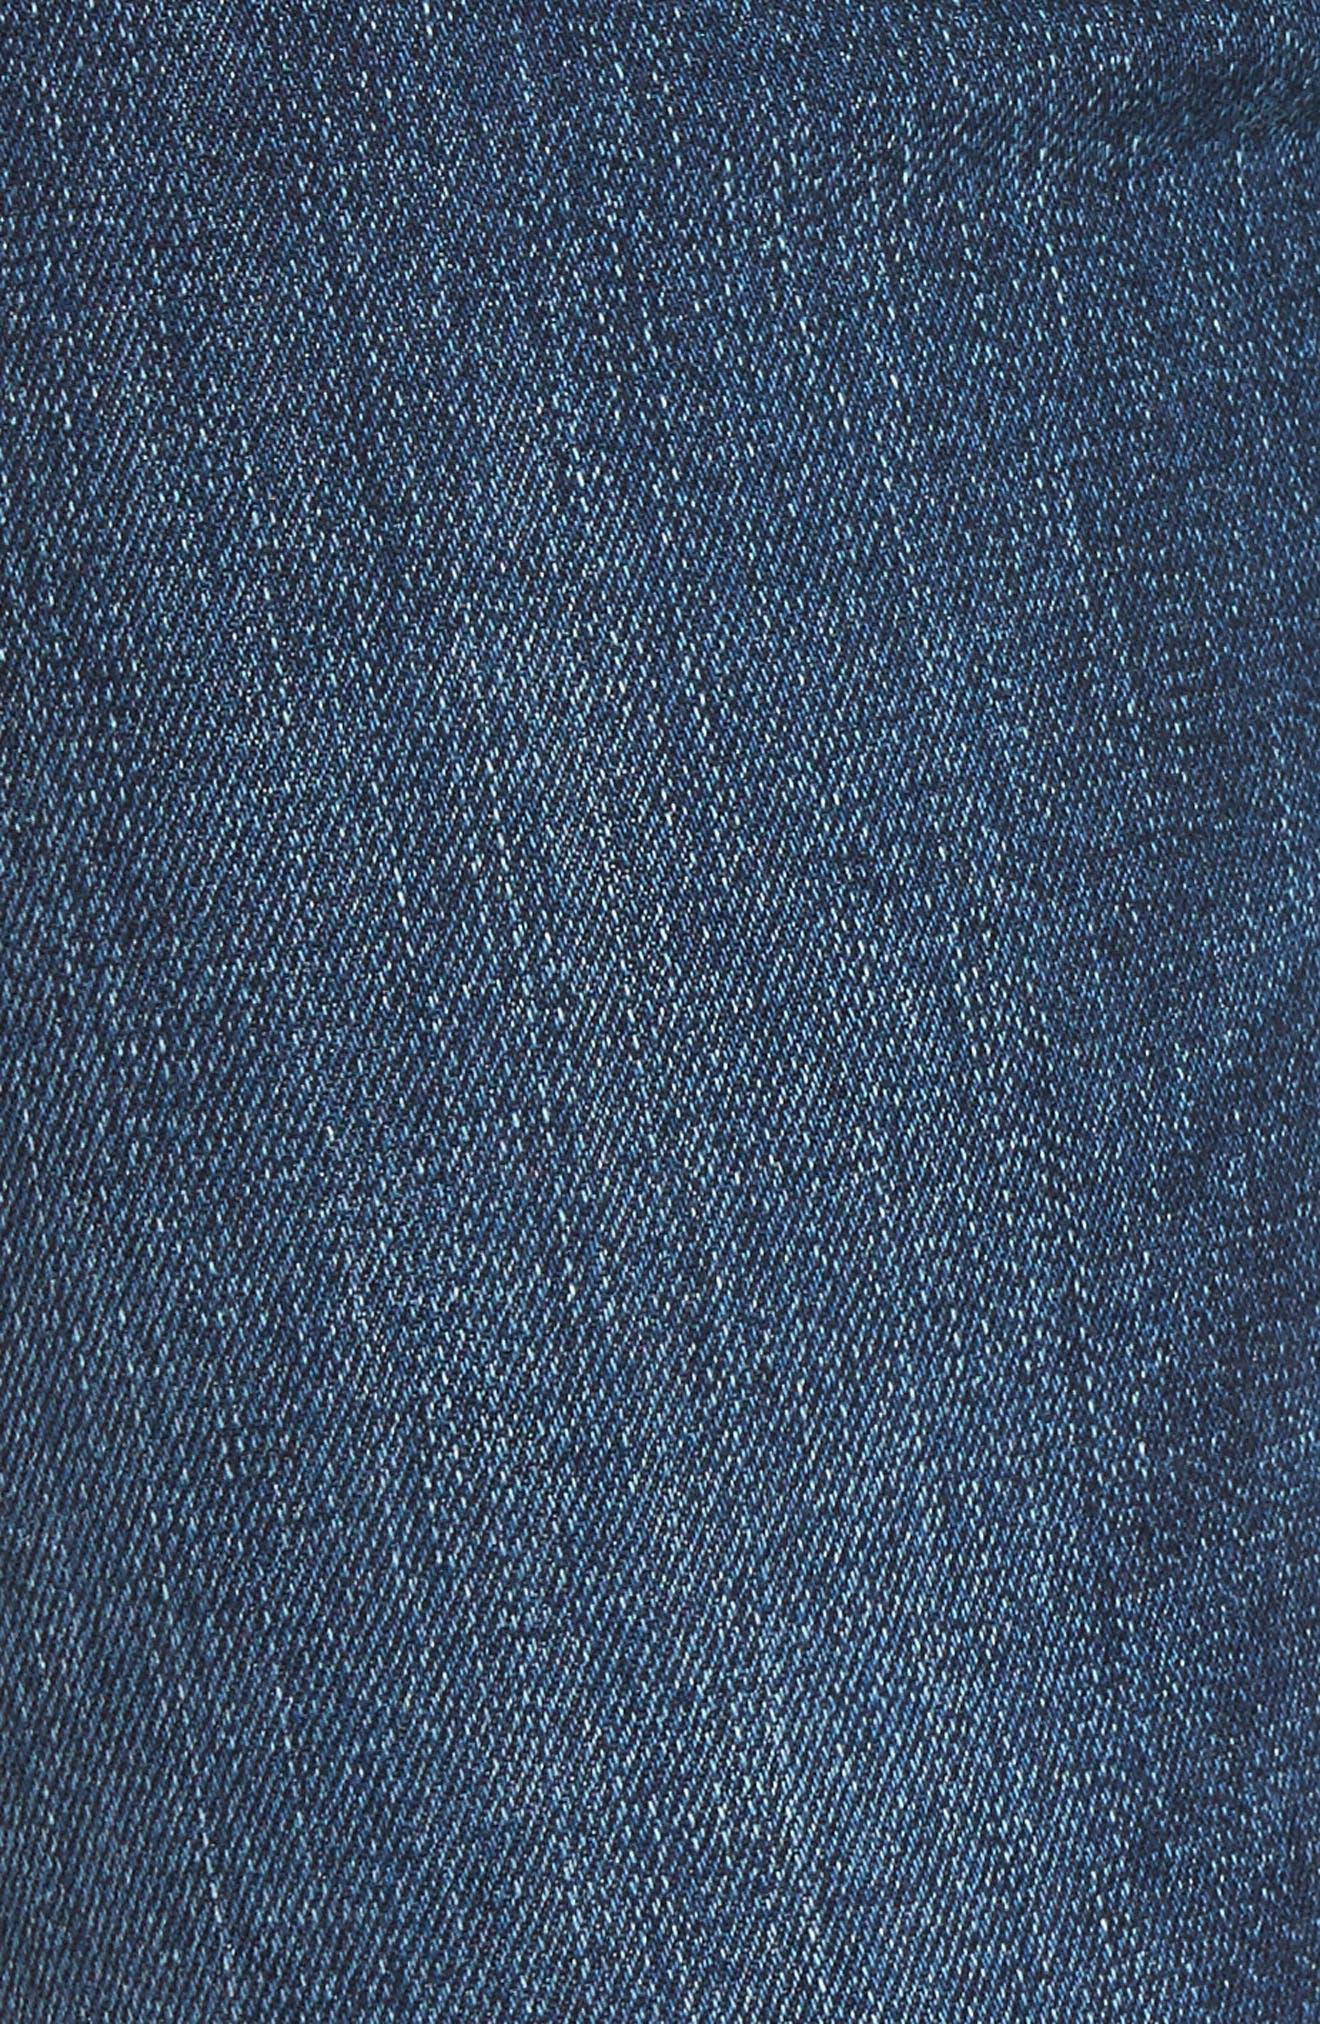 Barbara High Waist Super Skinny Jeans,                             Alternate thumbnail 6, color,                             Fatal